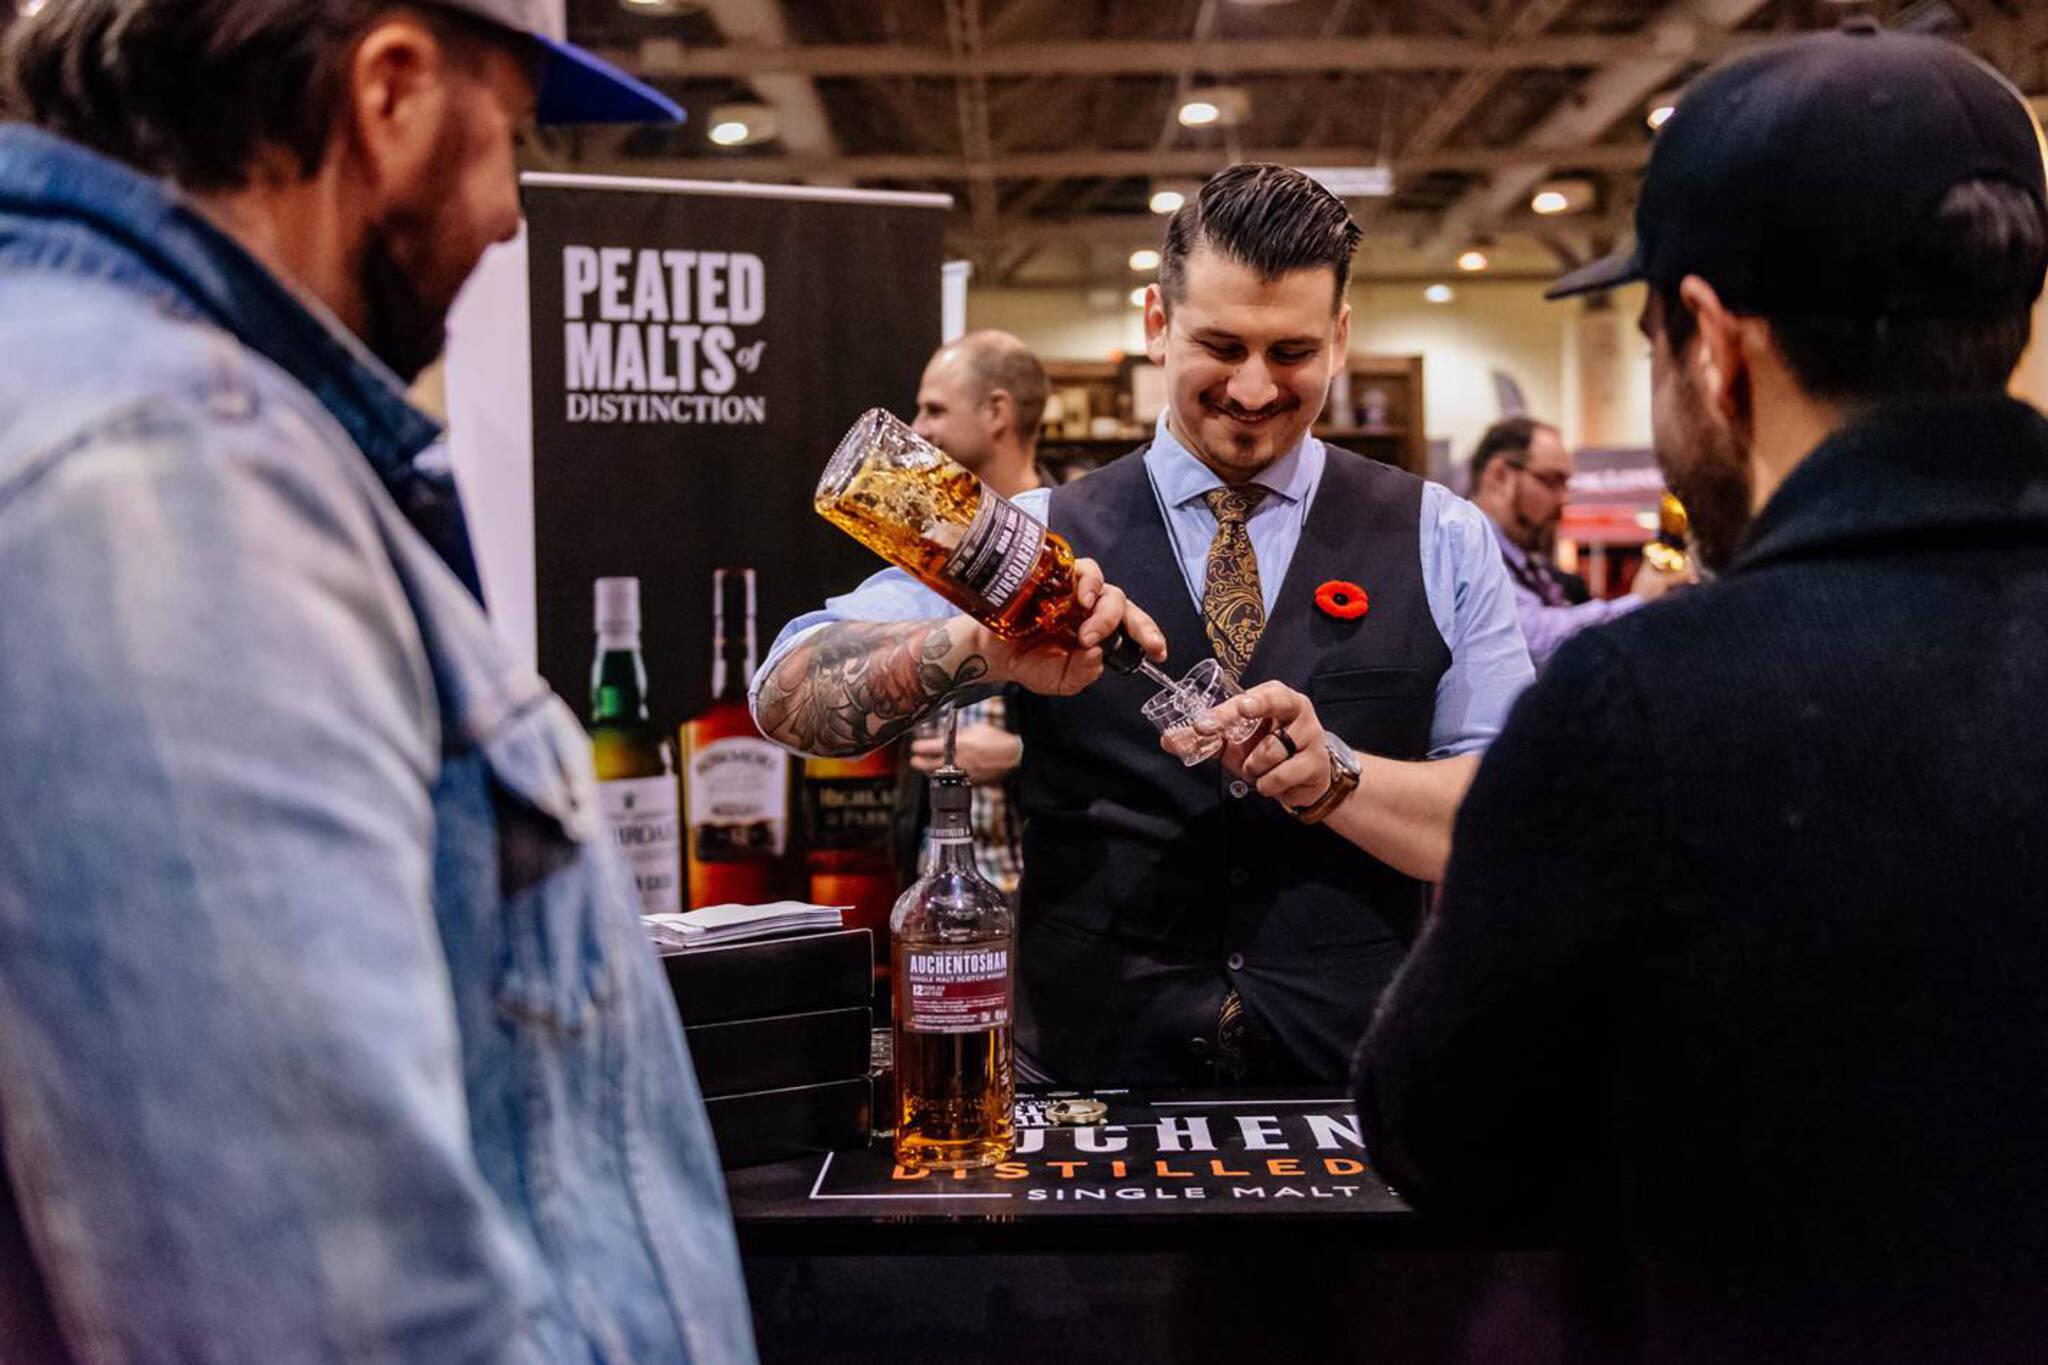 Gentlemens Expo Toronto